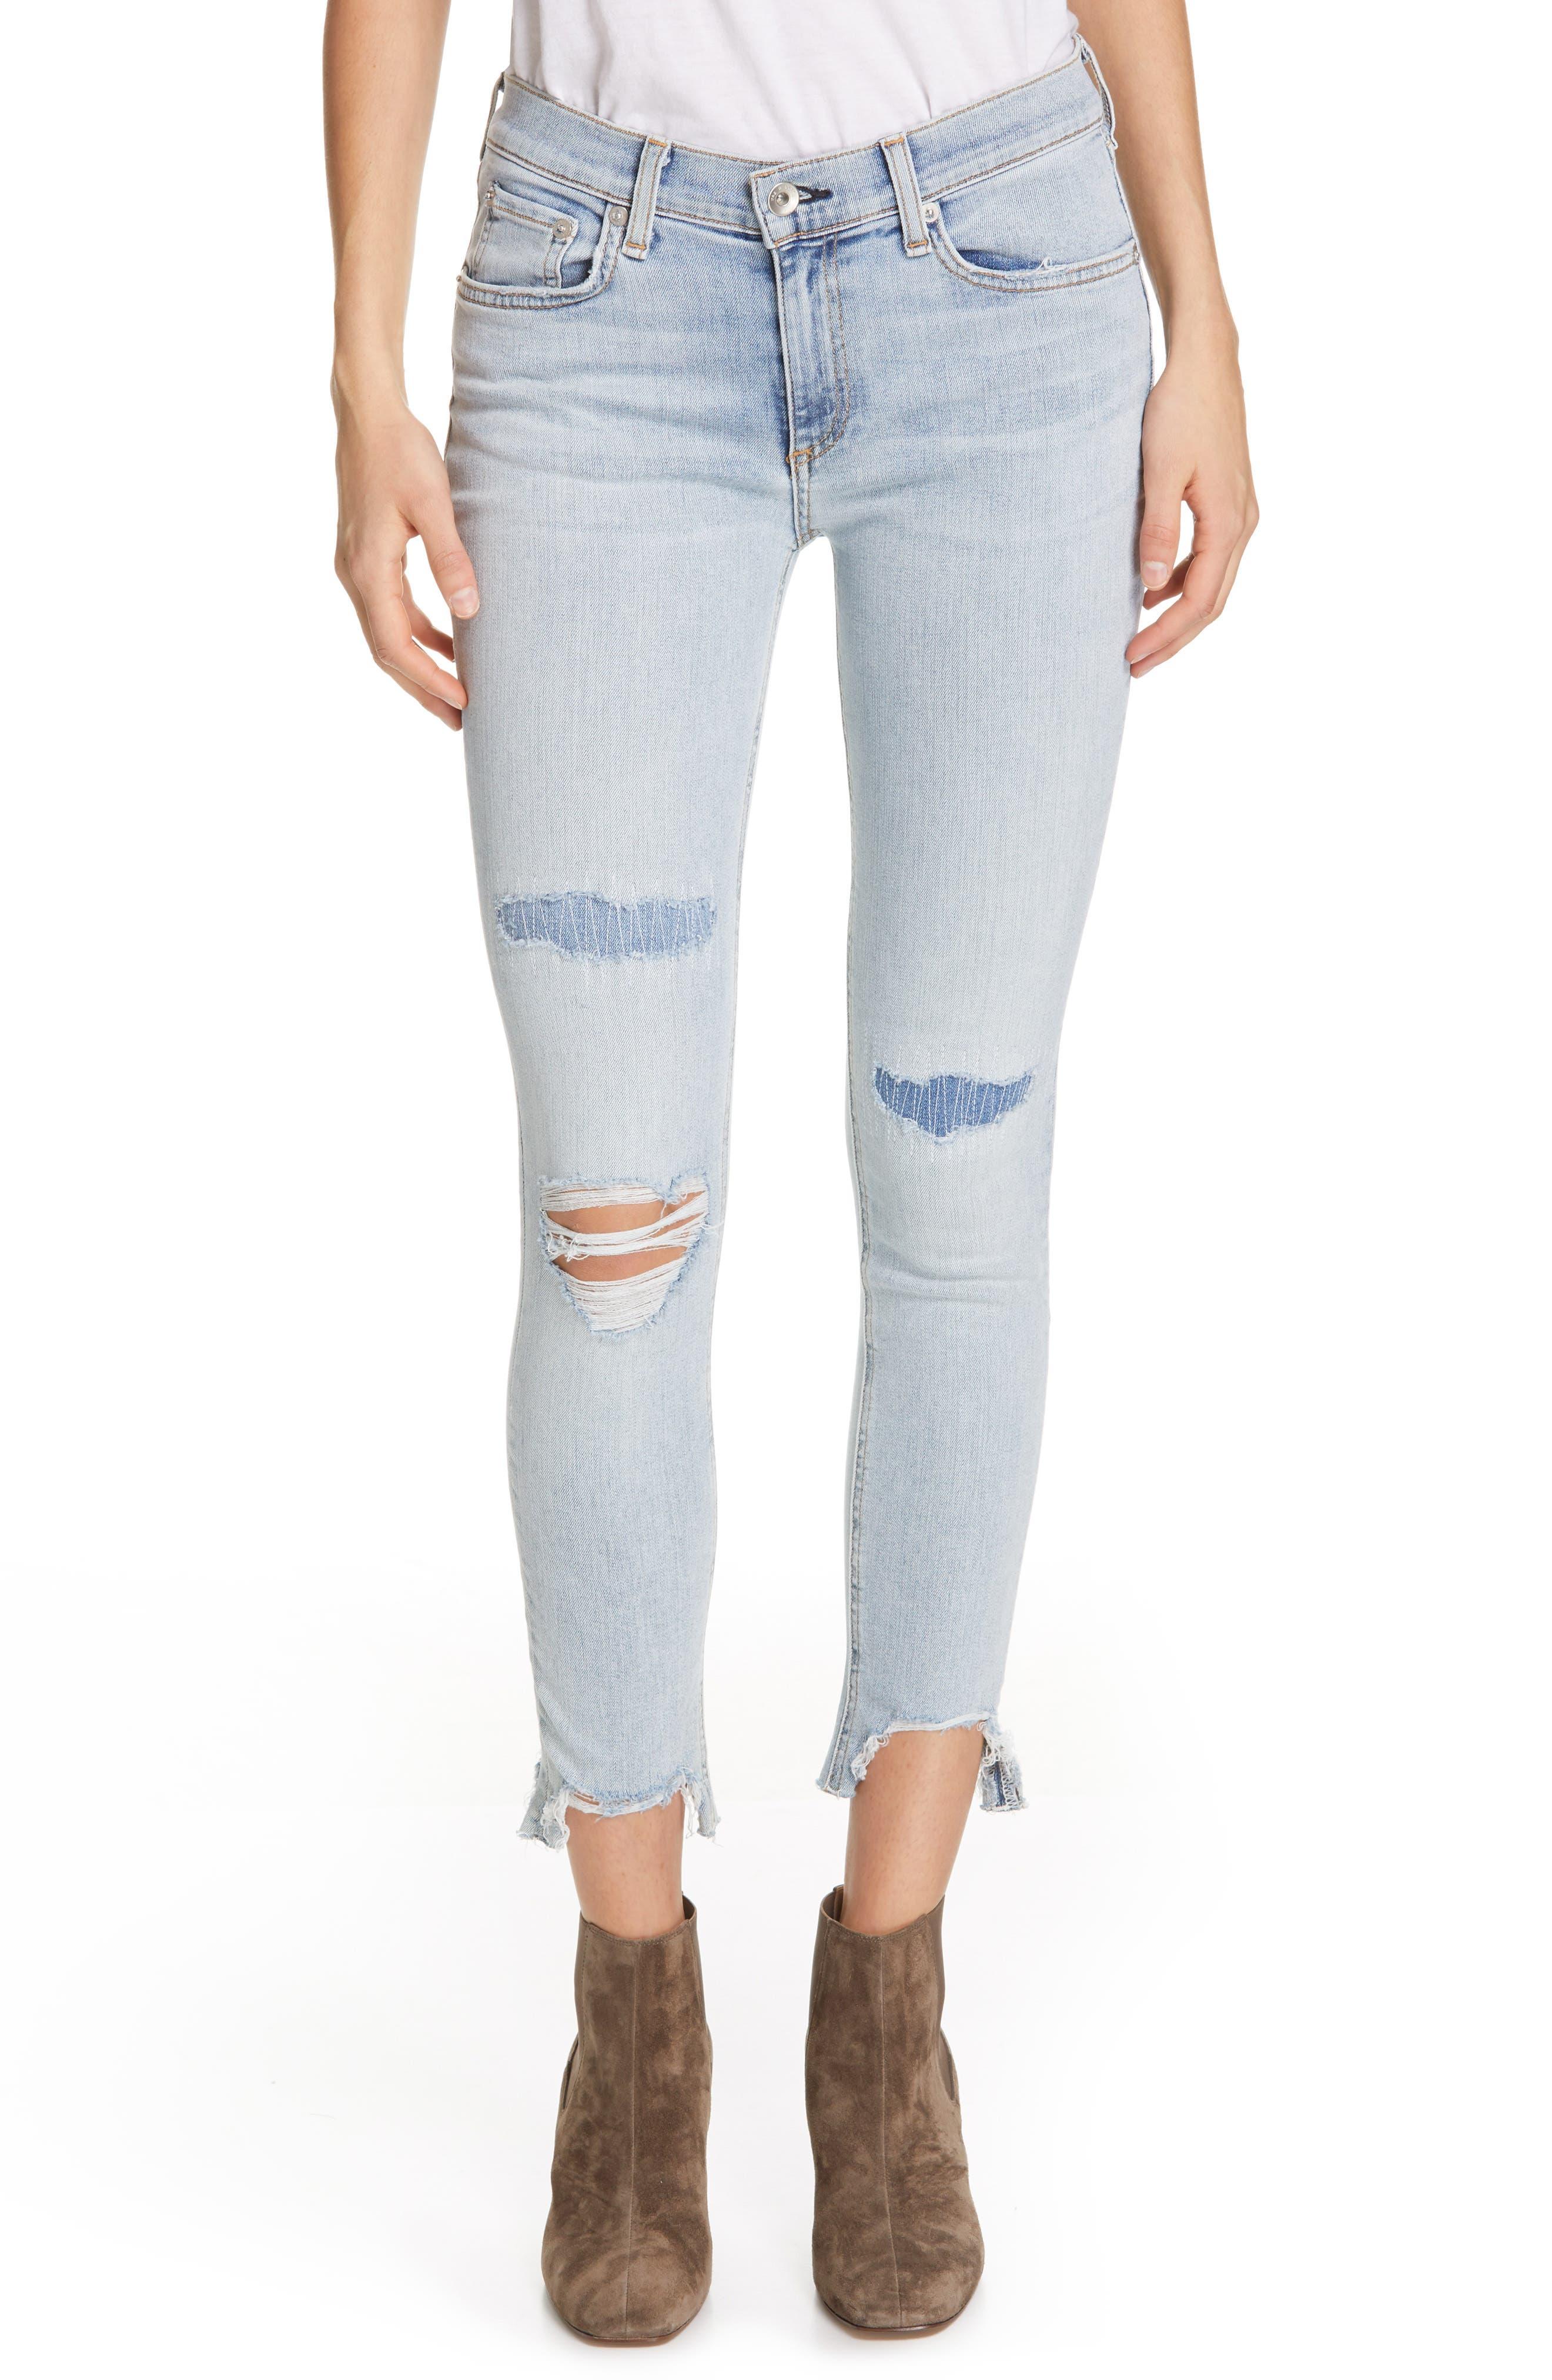 RAG & BONE JEAN Ripped Ankle Skinny Jeans, Main, color, 450